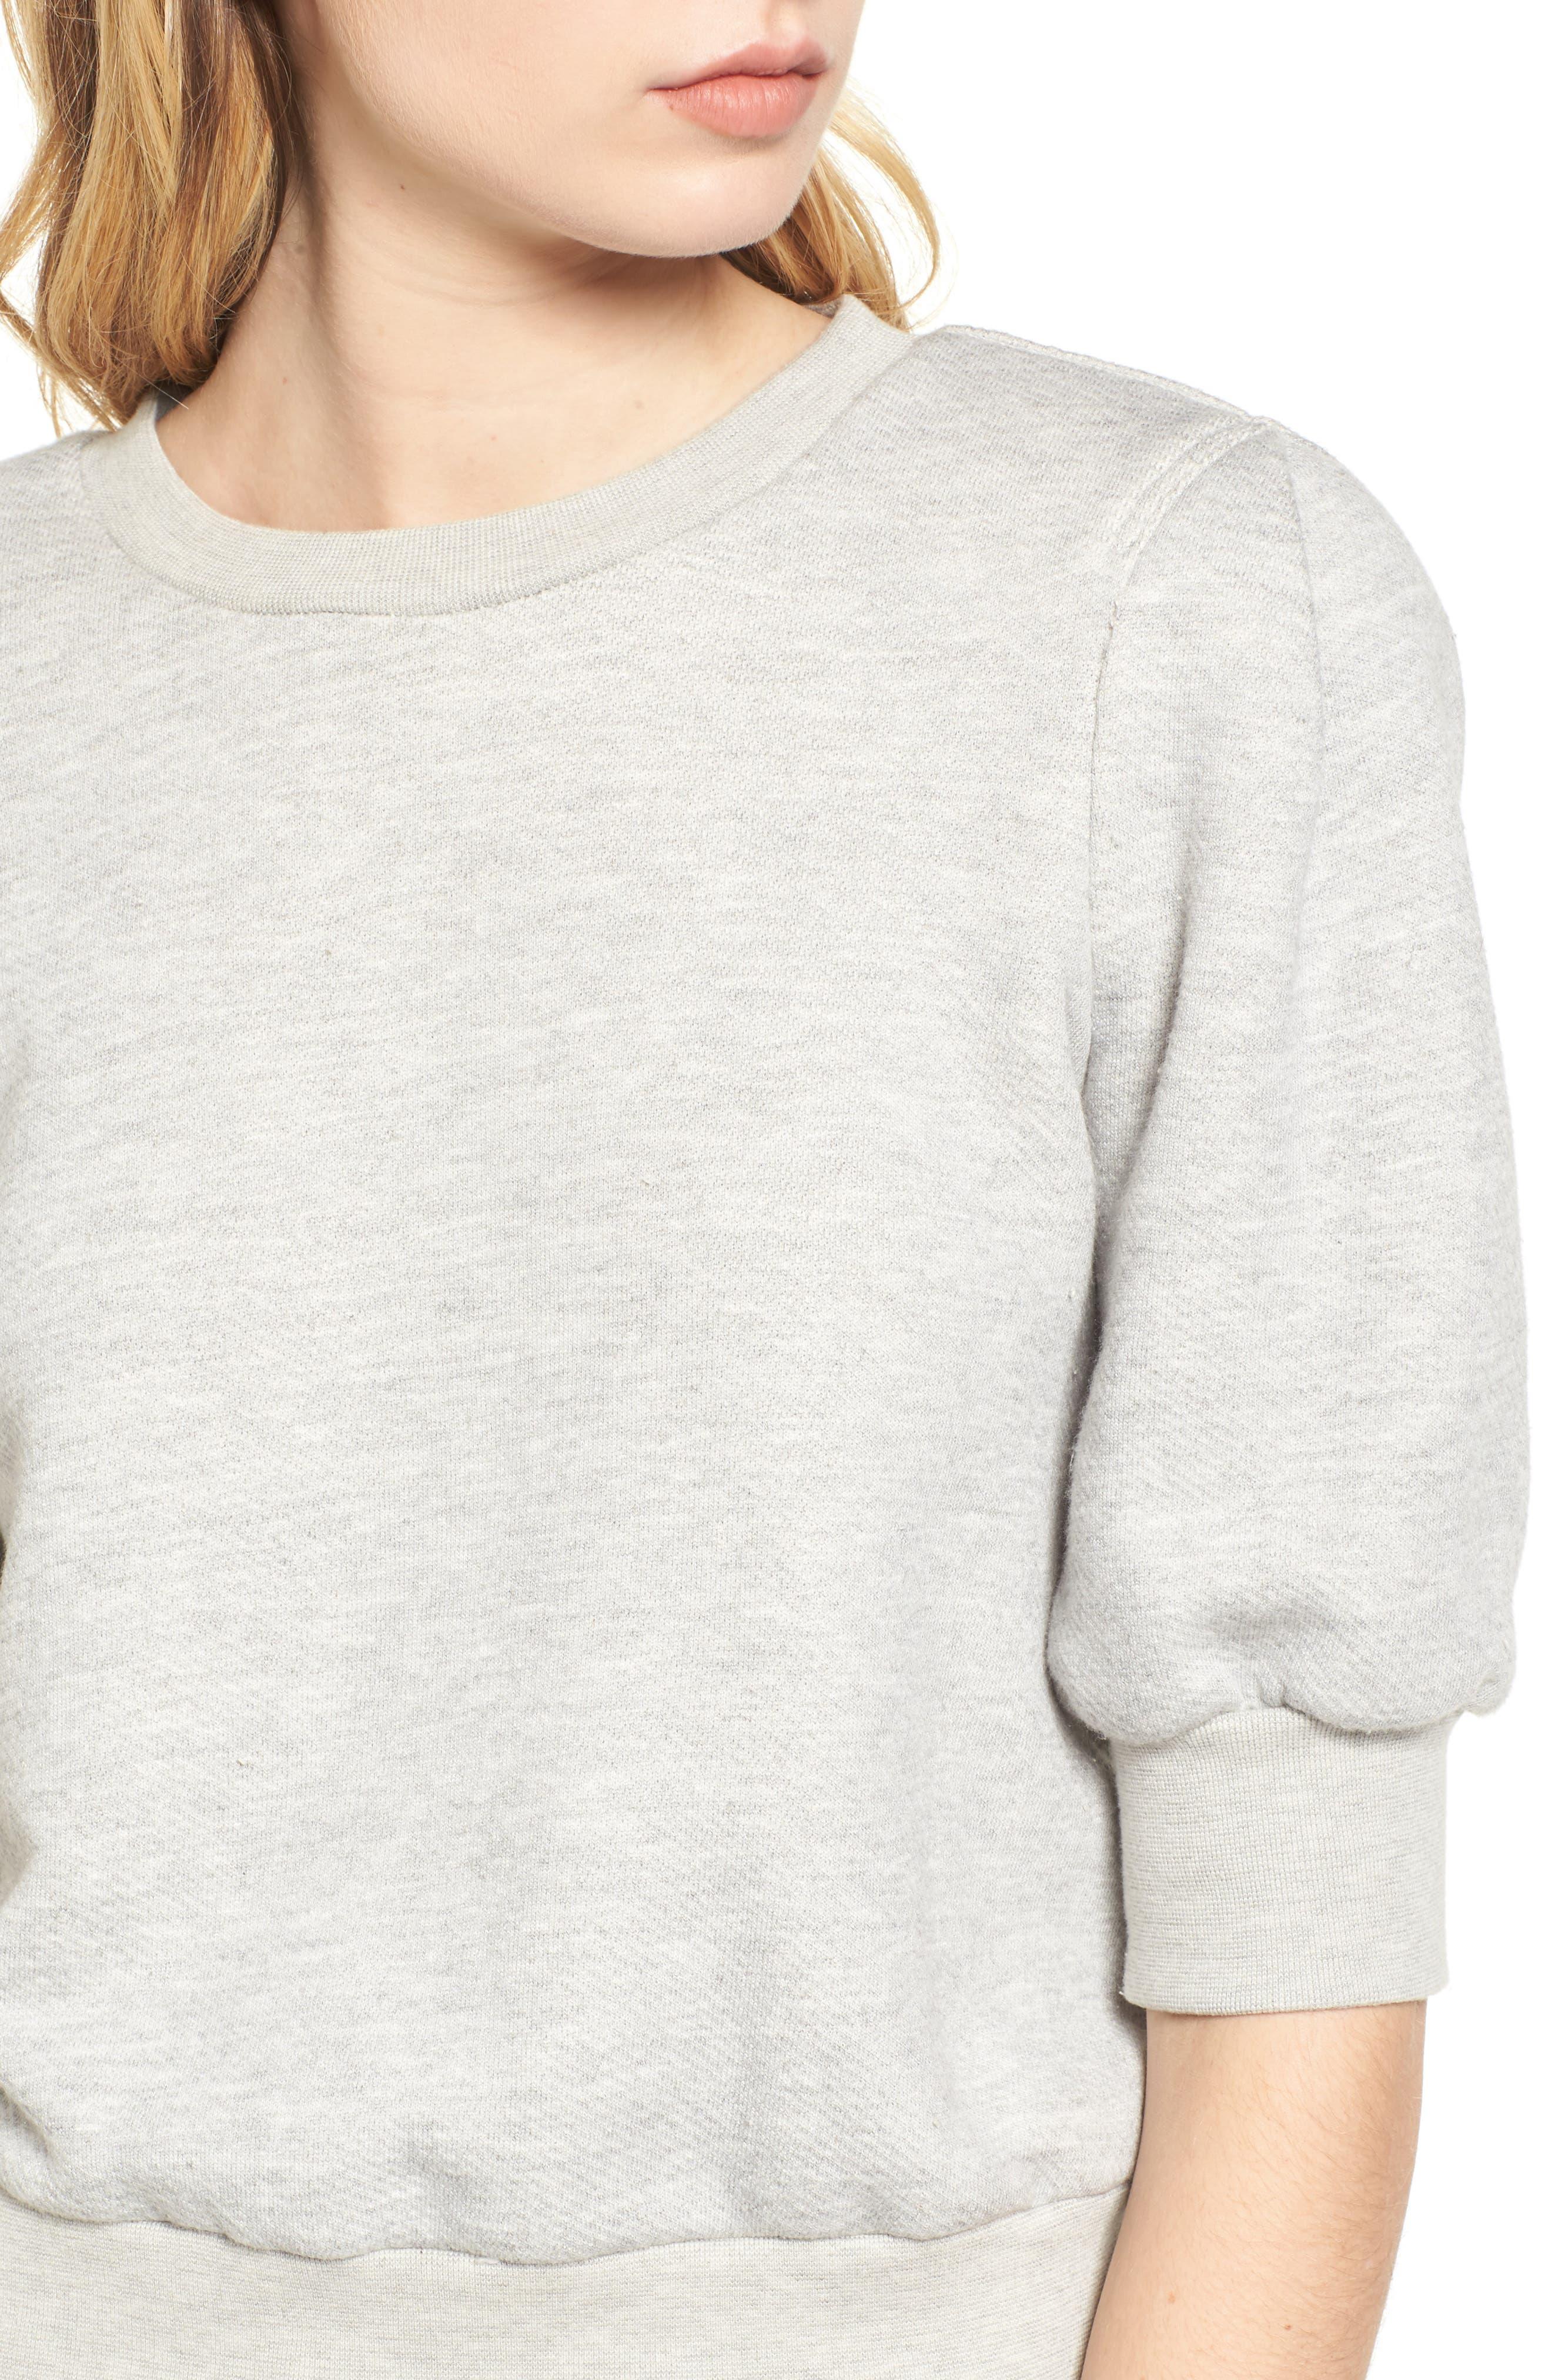 The Pleat Sweatshirt,                             Alternate thumbnail 4, color,                             Light Heather Grey Terry